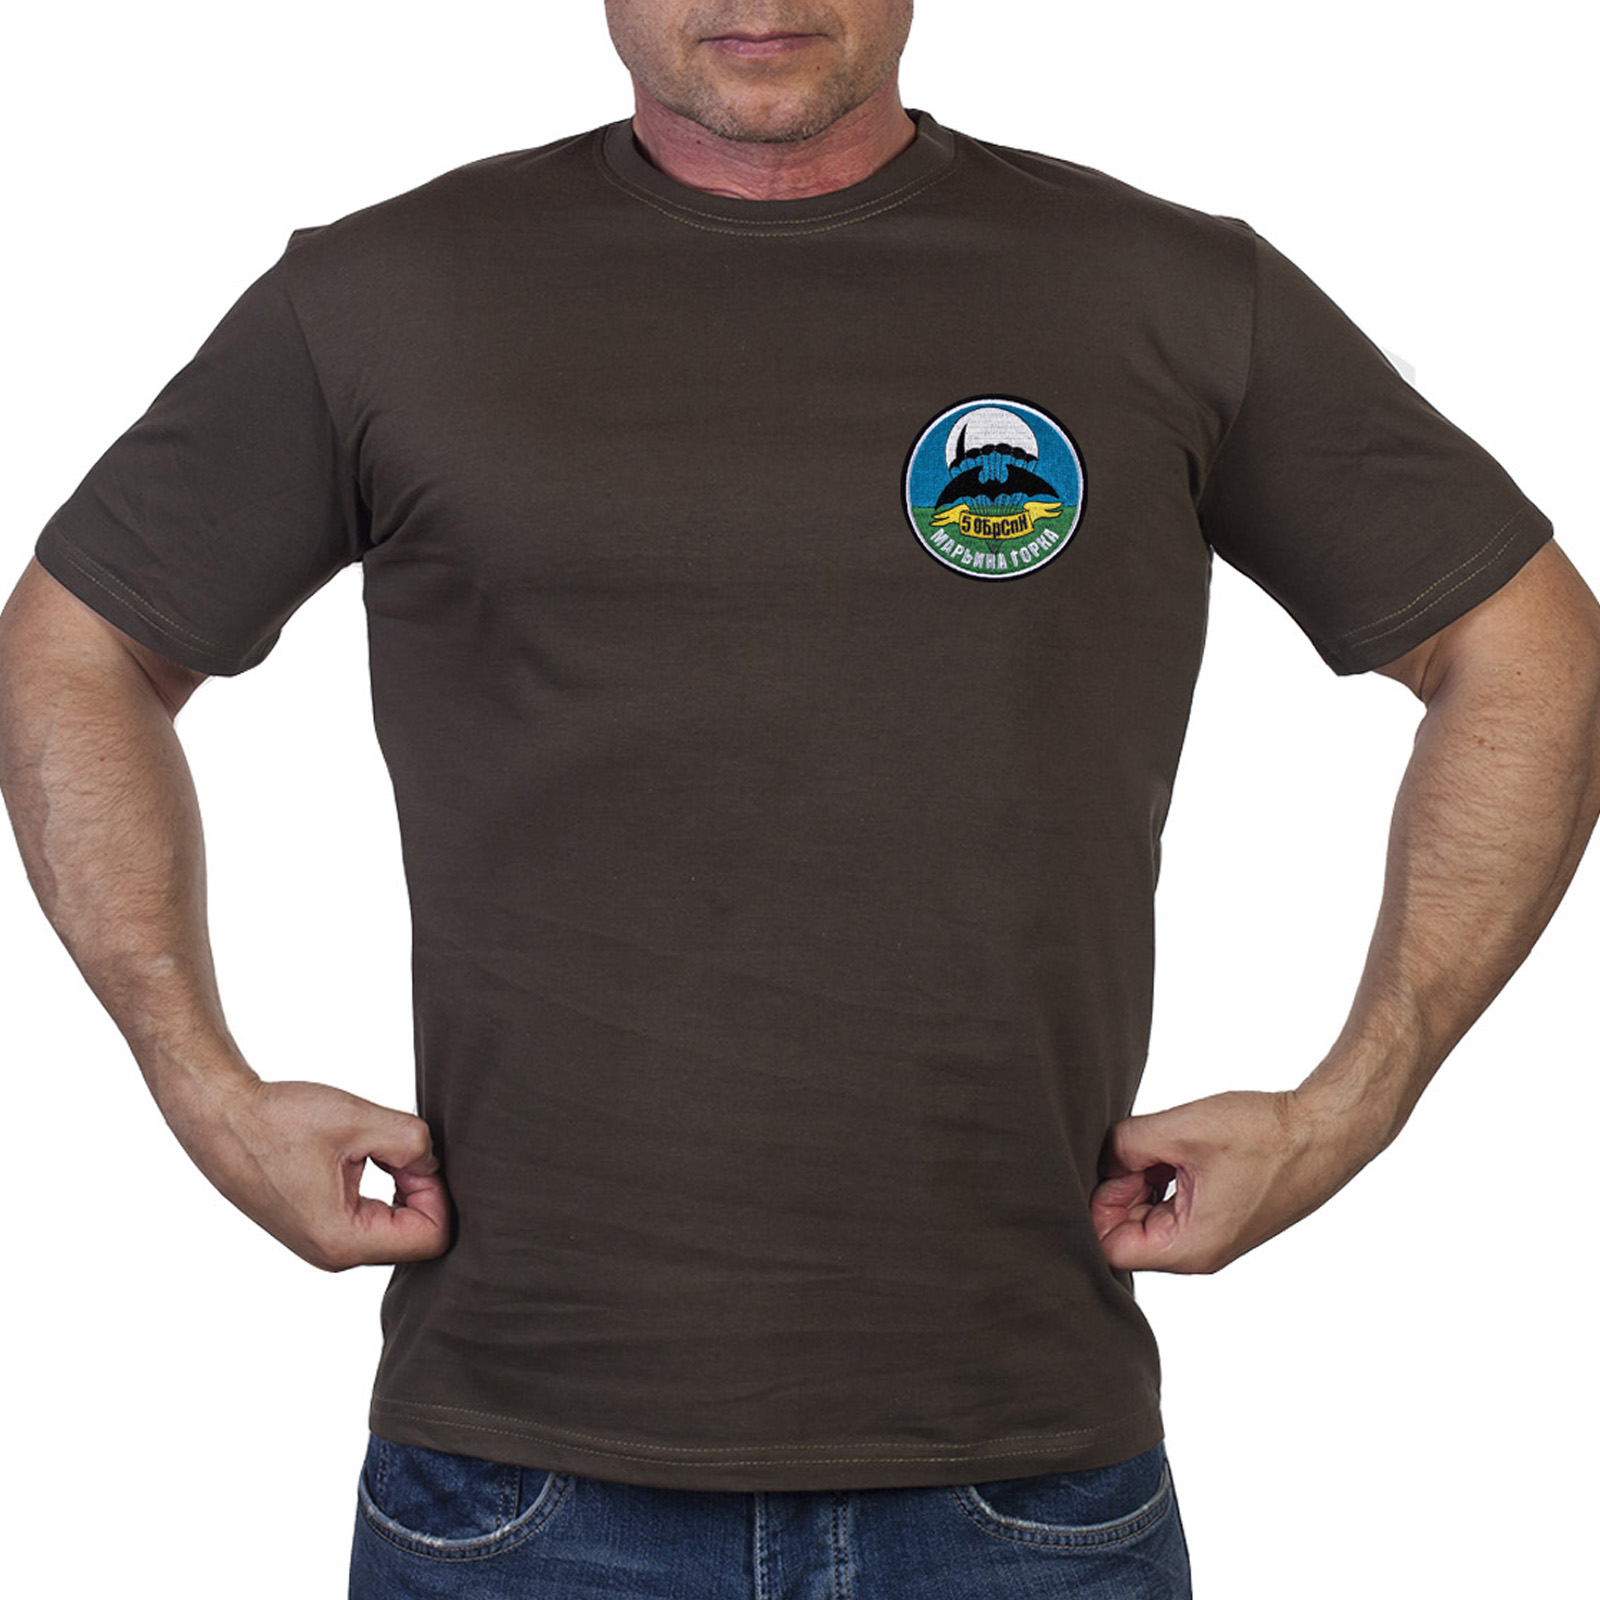 Хаки футболка 5 ОБрСпН г. Марьина Горка